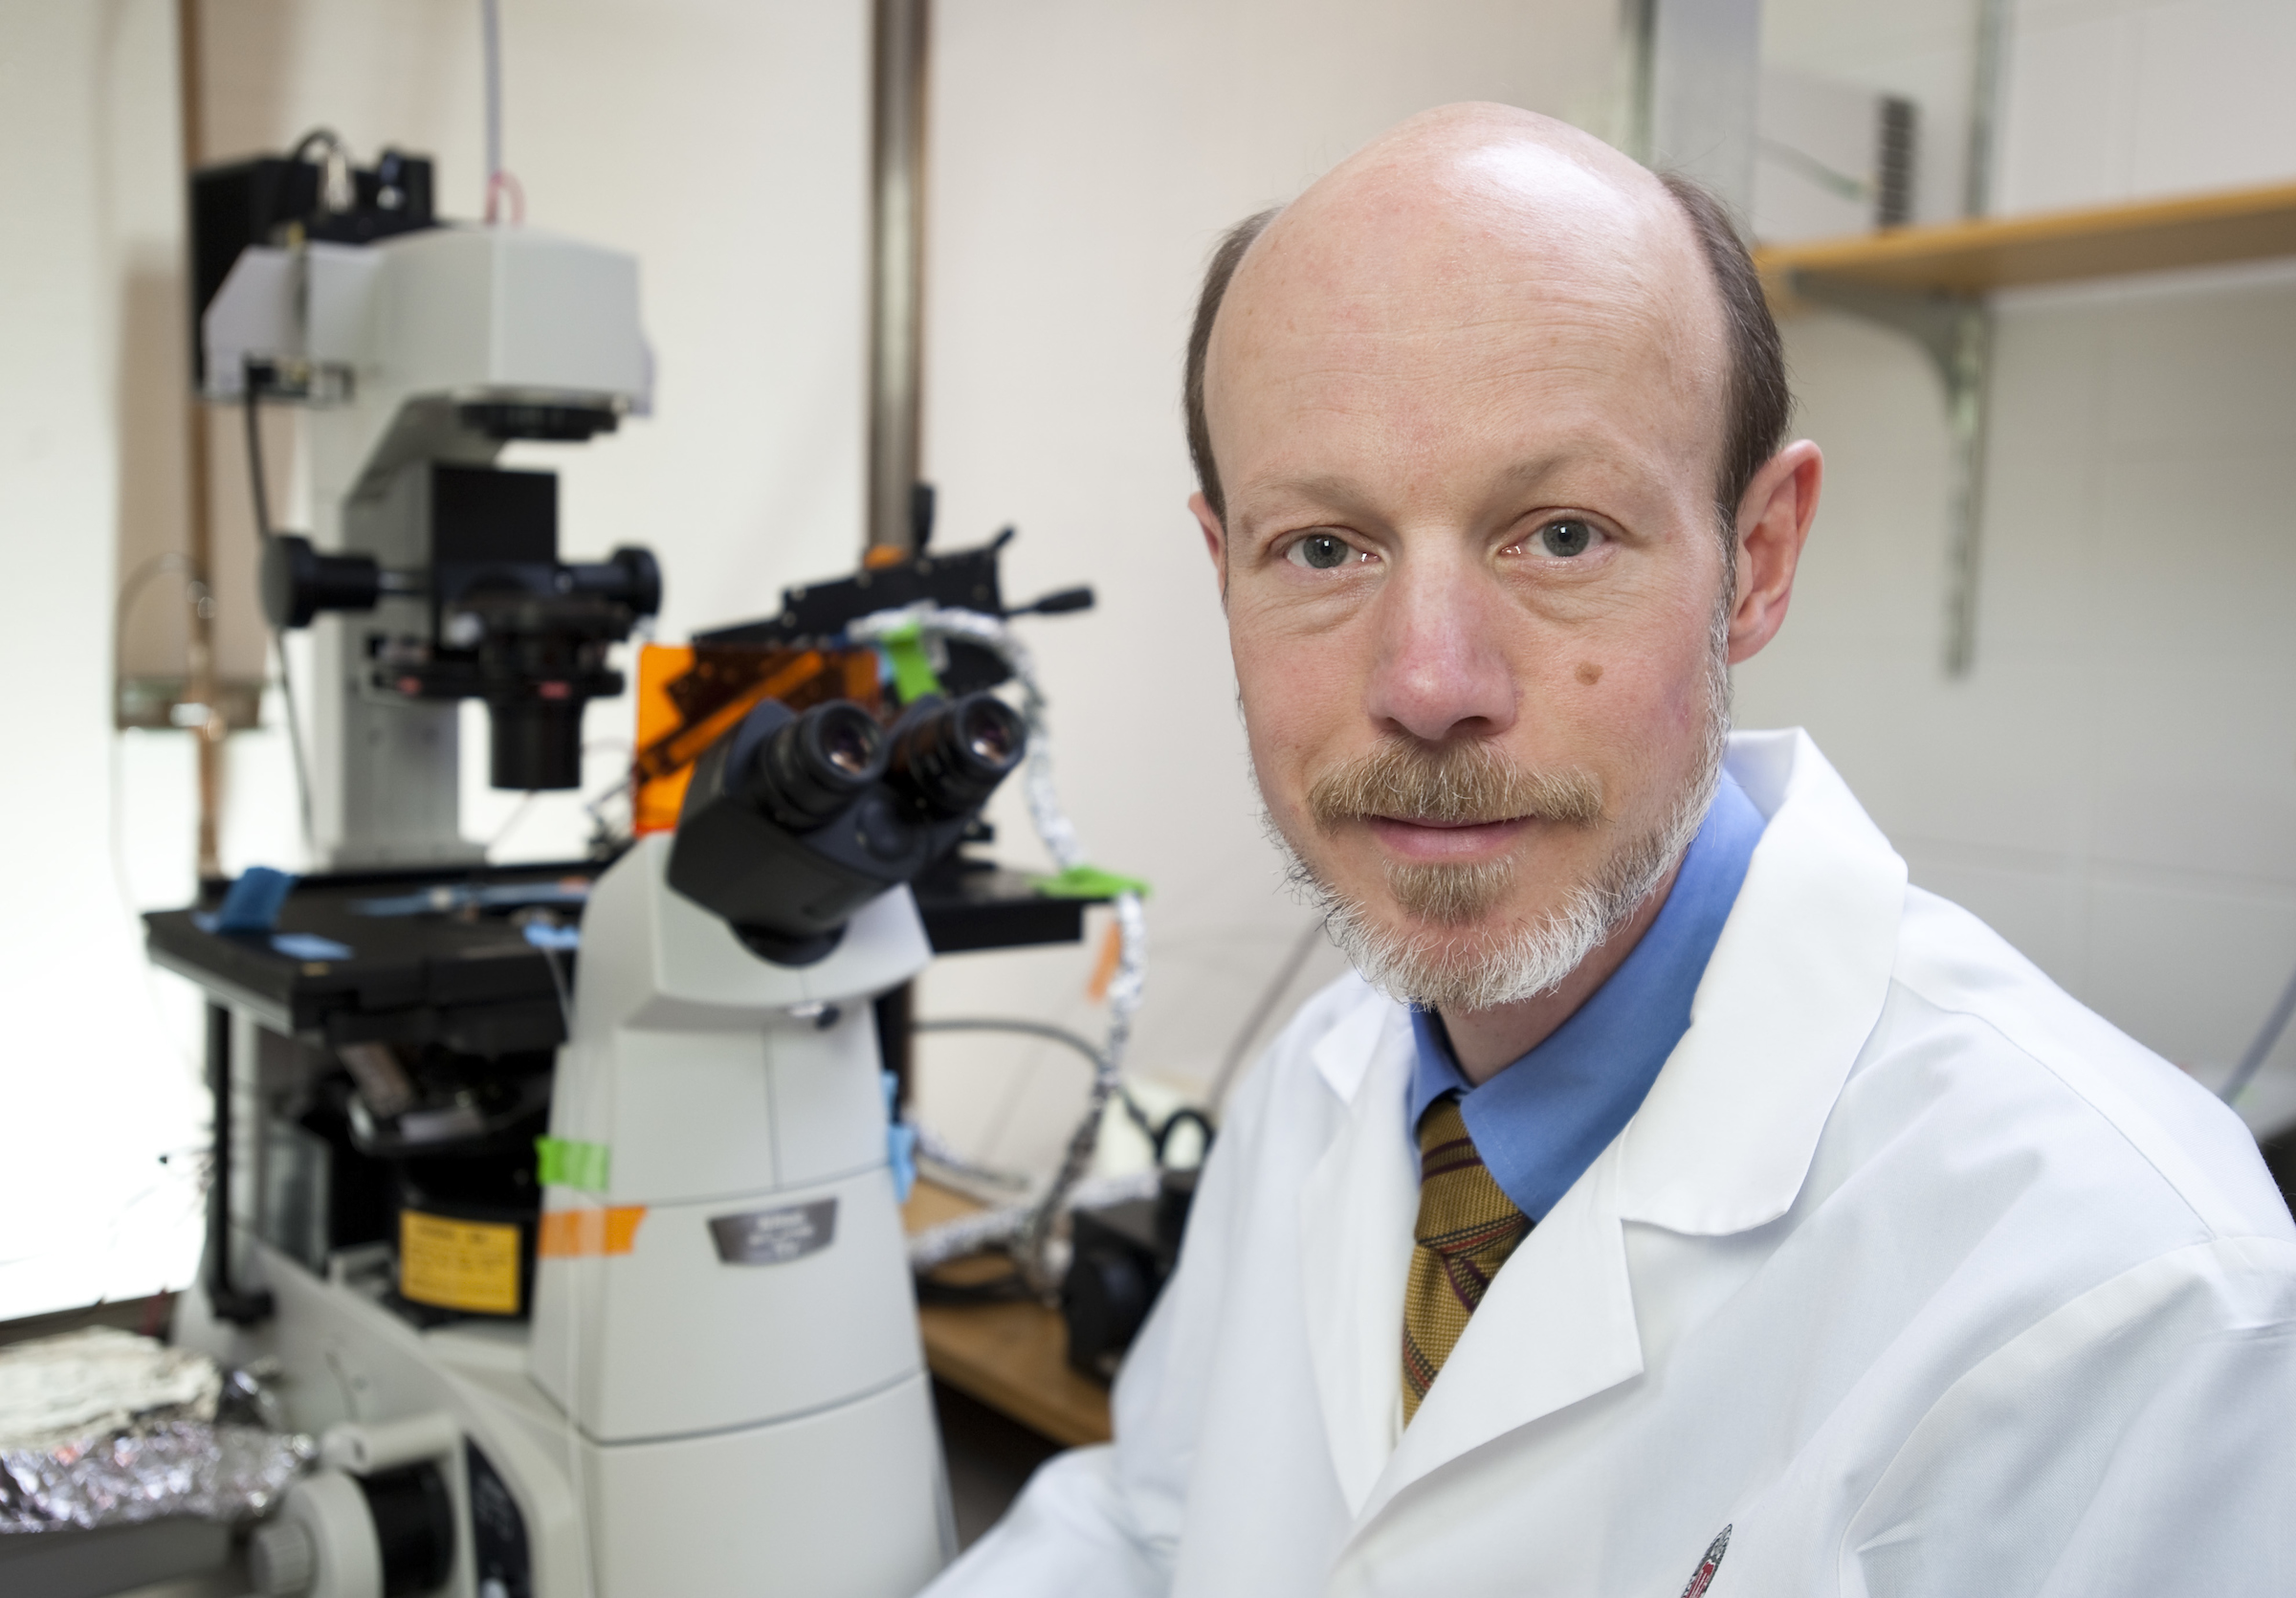 Stem Cells @ 20: The Stem Cell and Regenerative Medicine